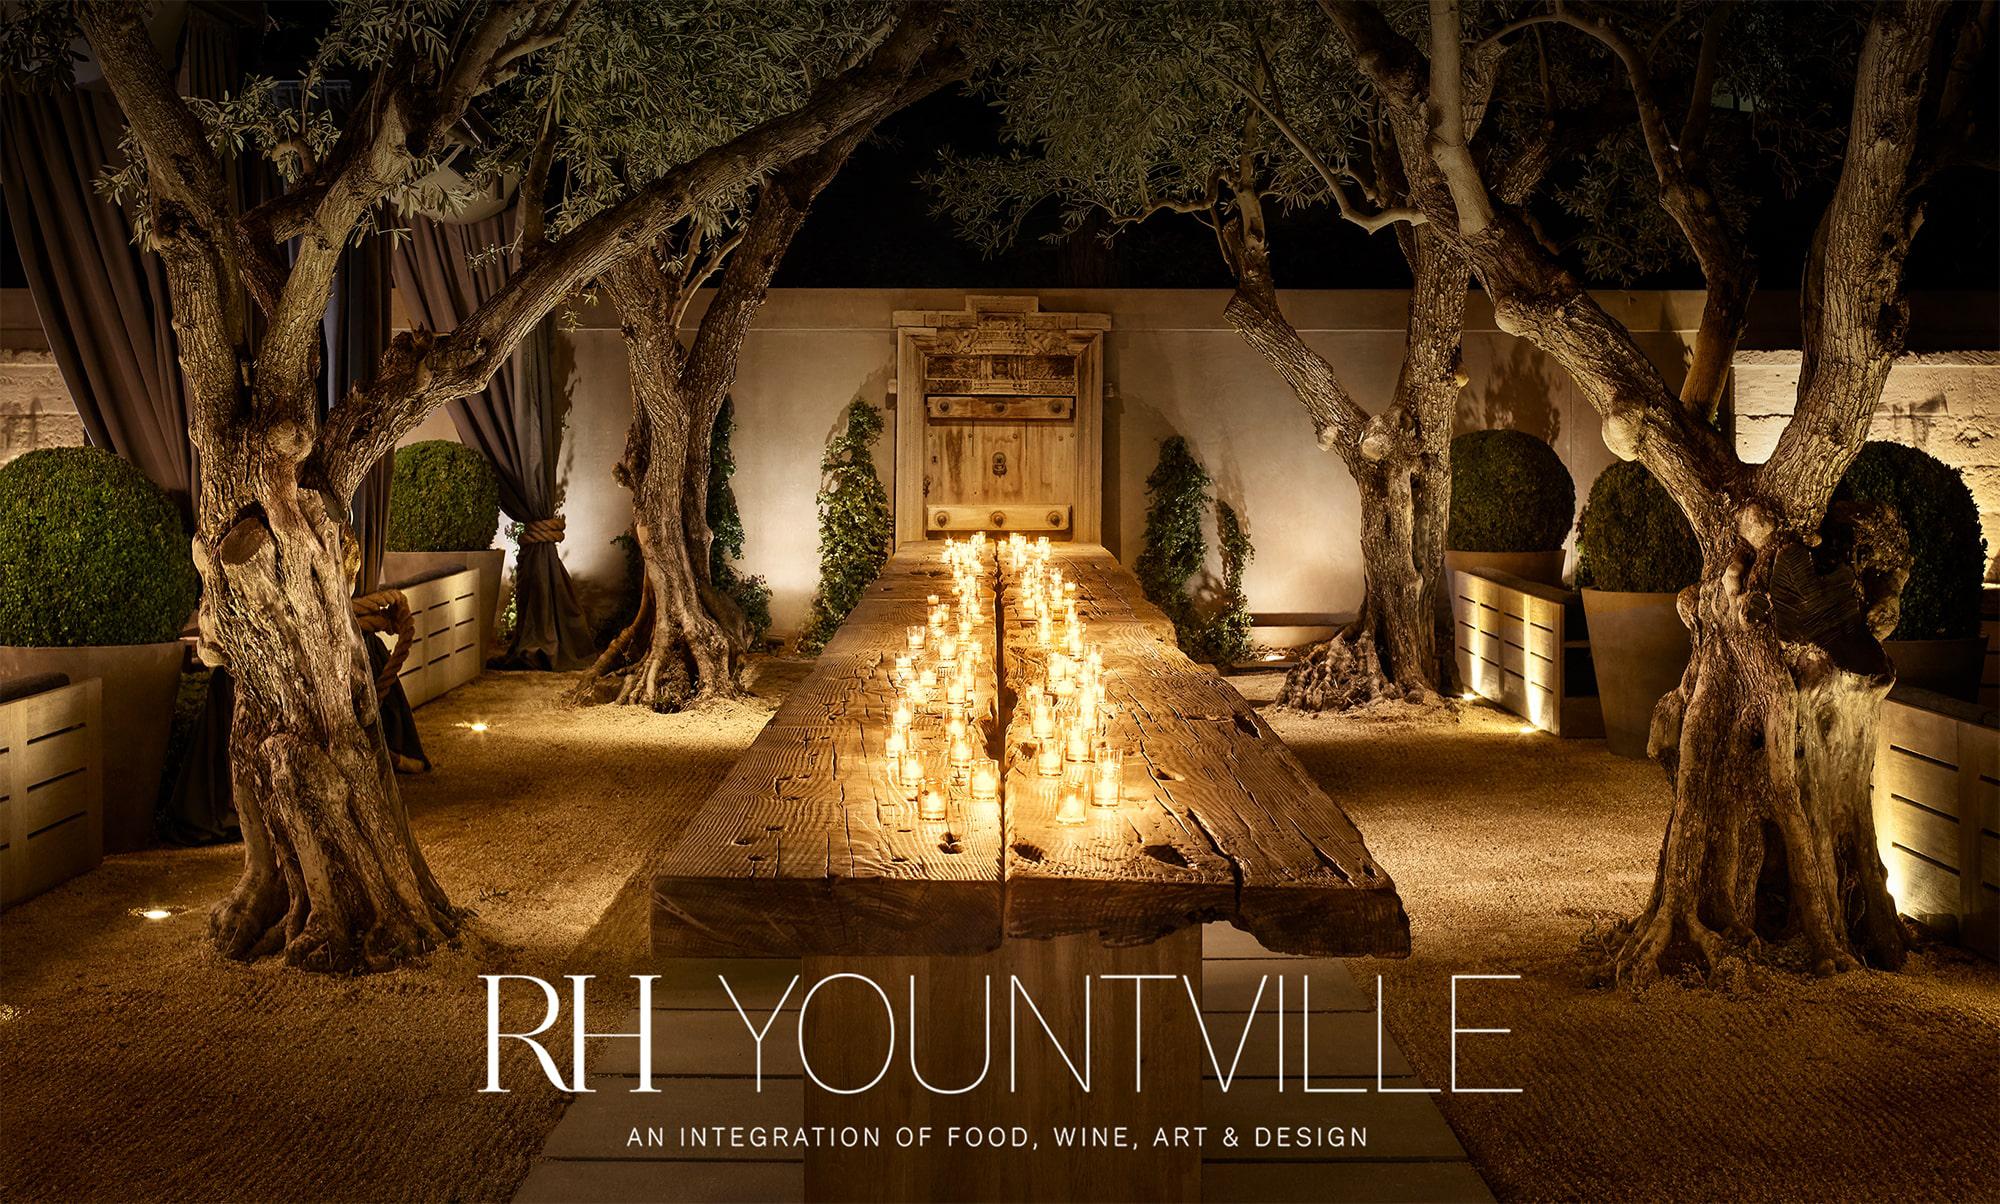 Yountville | RH